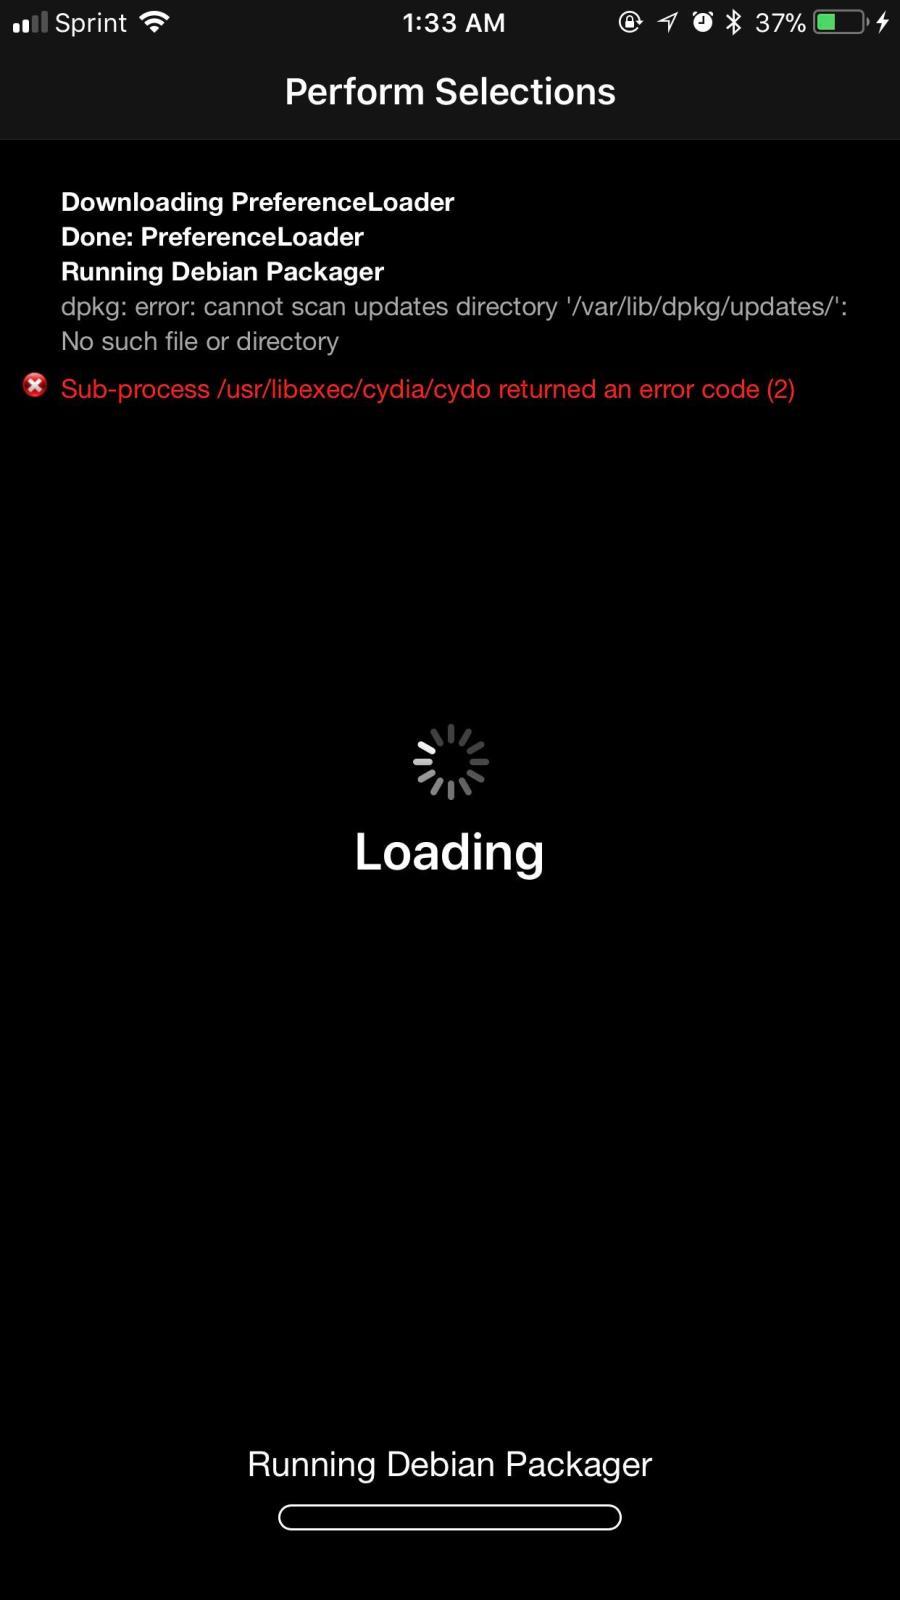 Tip If Youre Getting This Error Varlibdpkgupdates